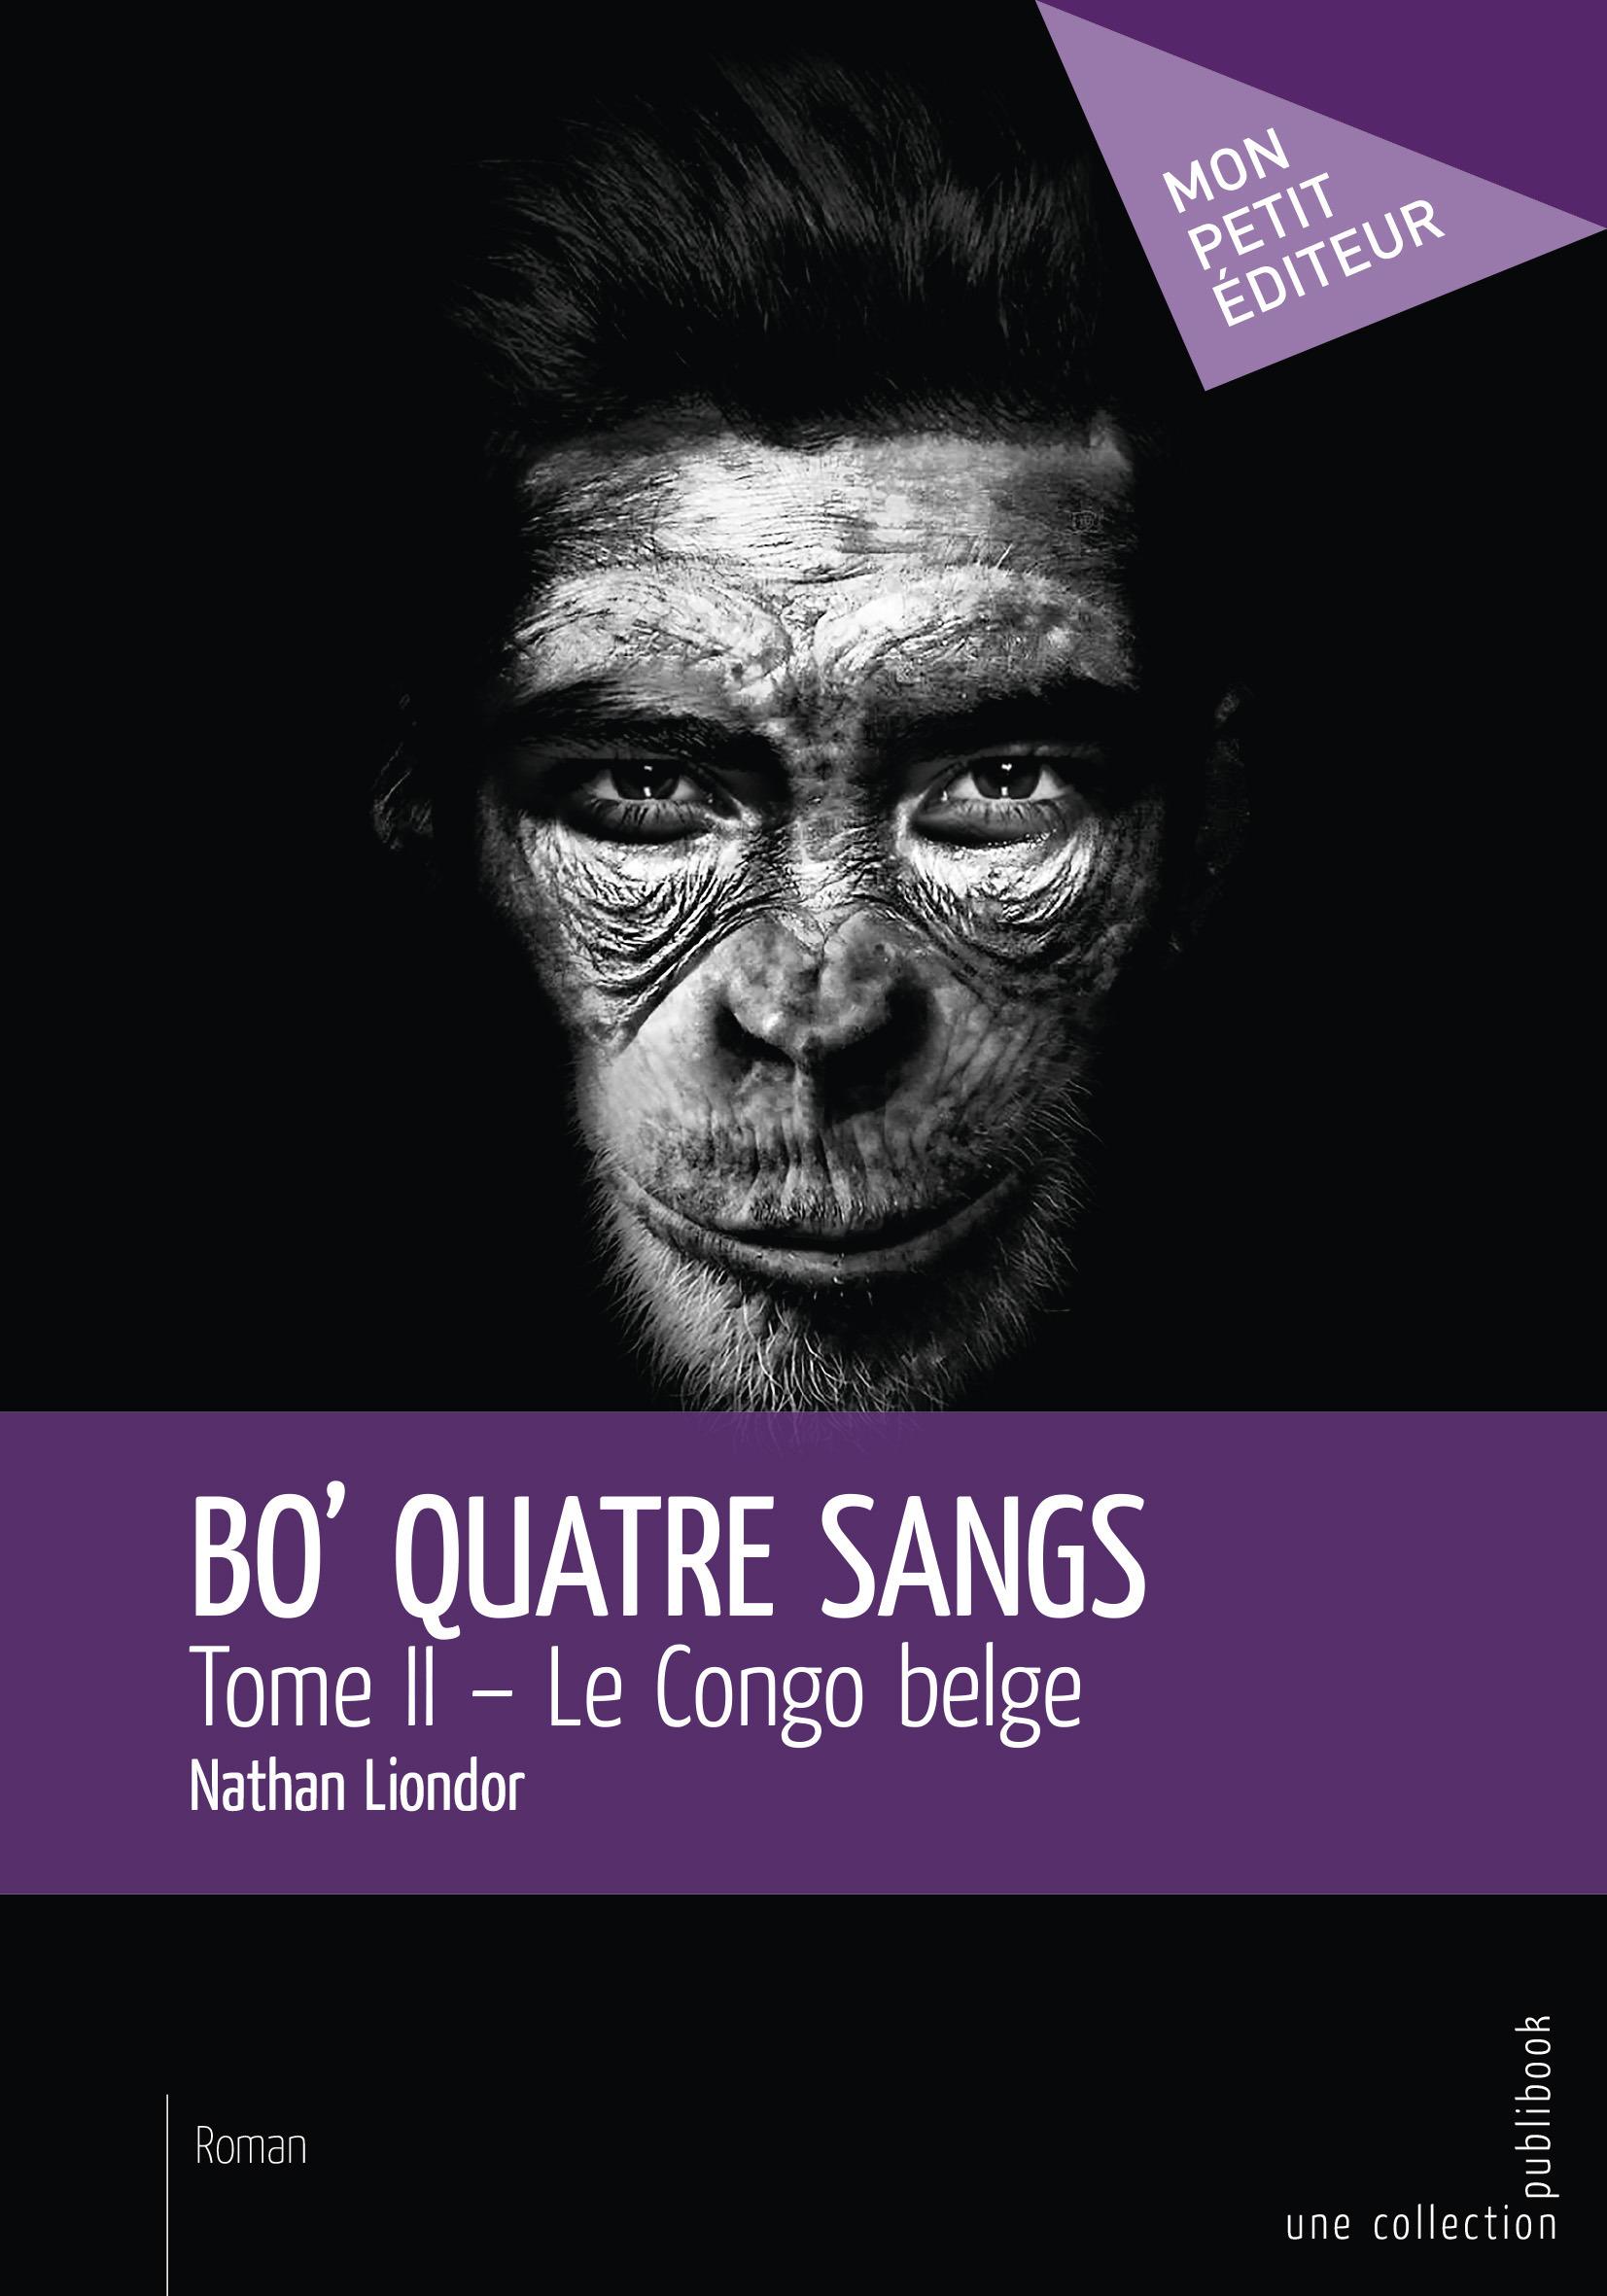 Nathan Liondor Bo' Quatre Sangs : Tome II